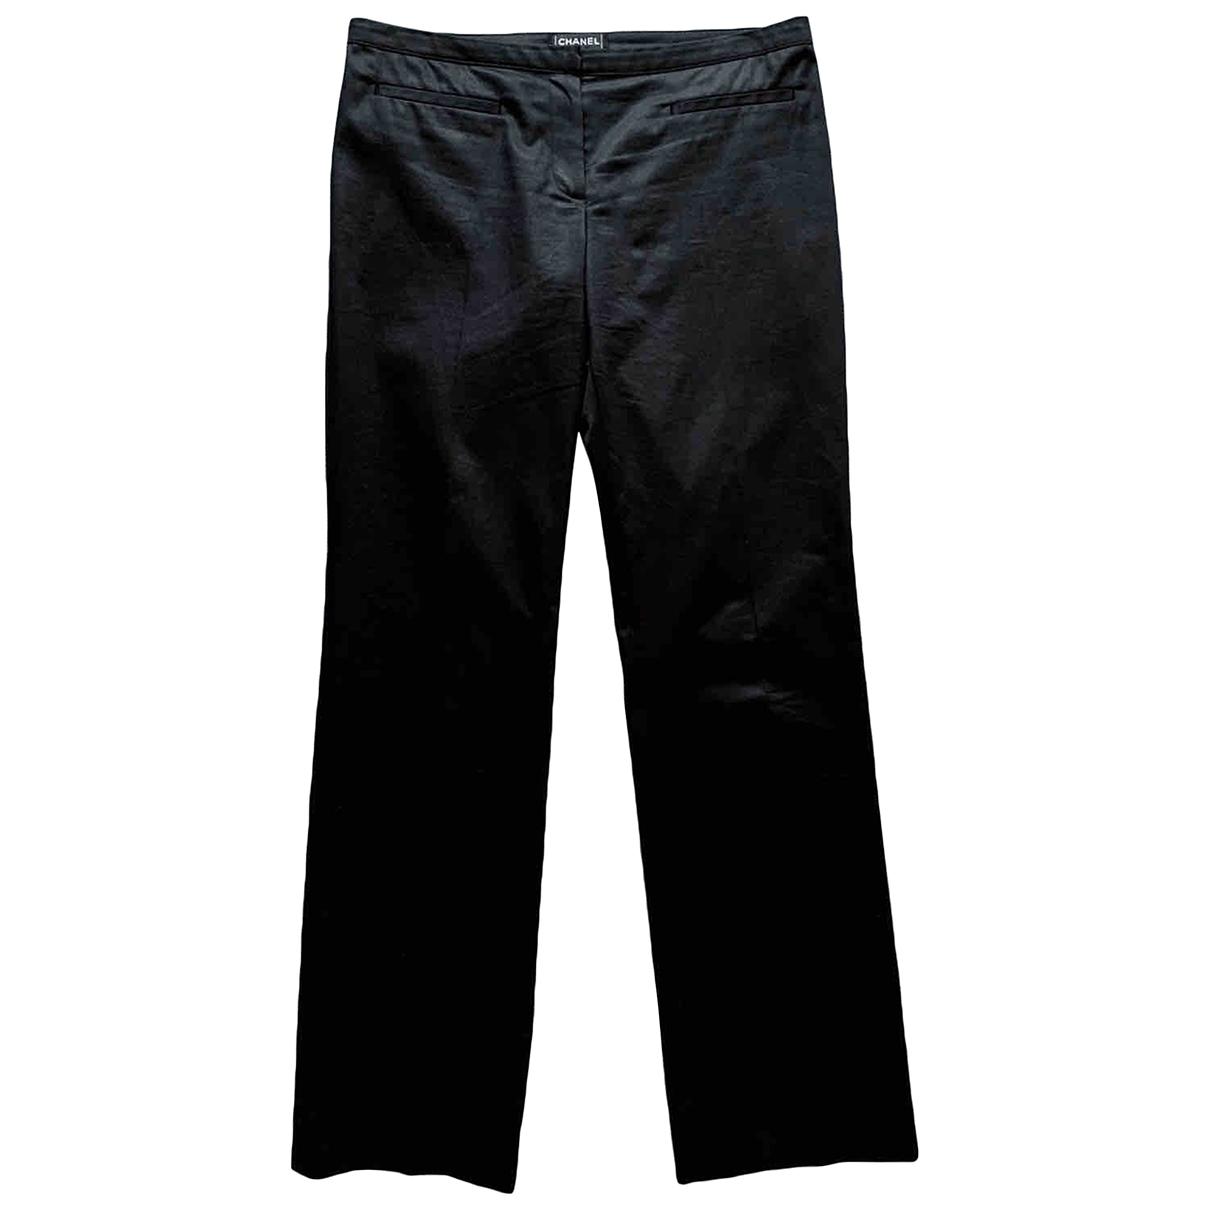 Chanel \N Black Cotton Trousers for Men M International